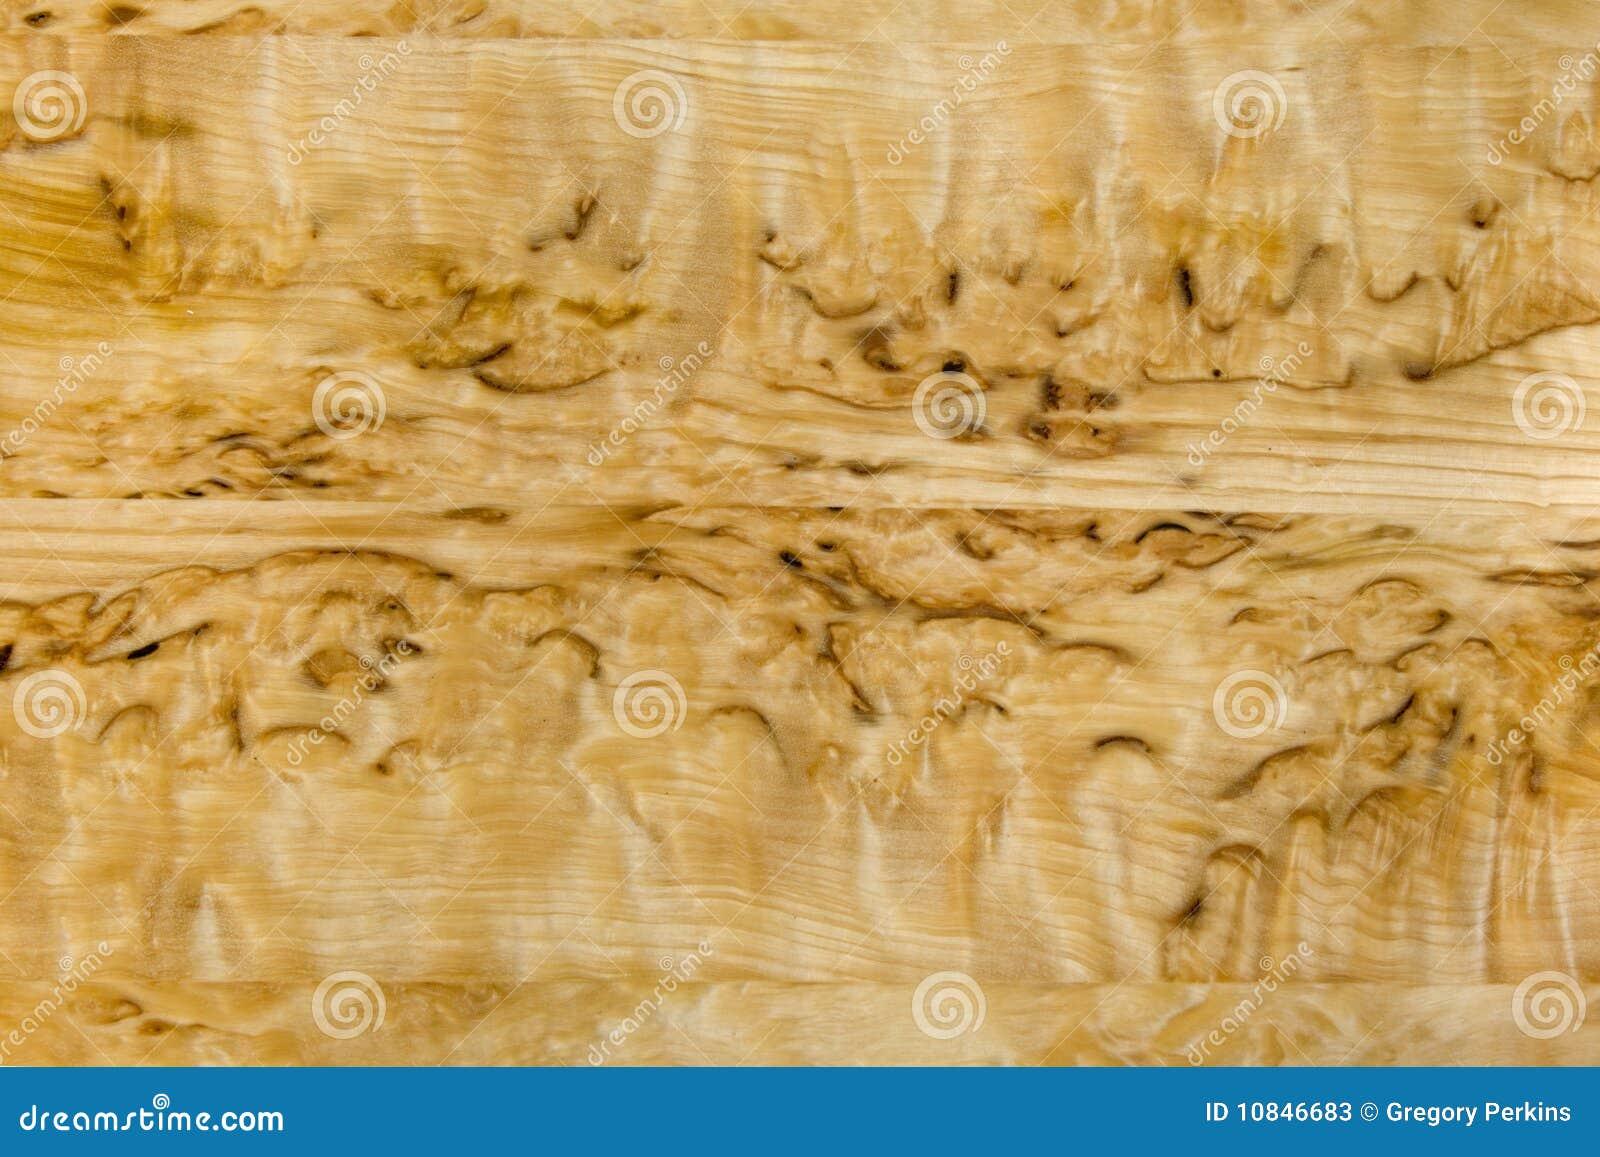 Birch Wood Grain ~ Attractive burled birch wood grain stock photos image